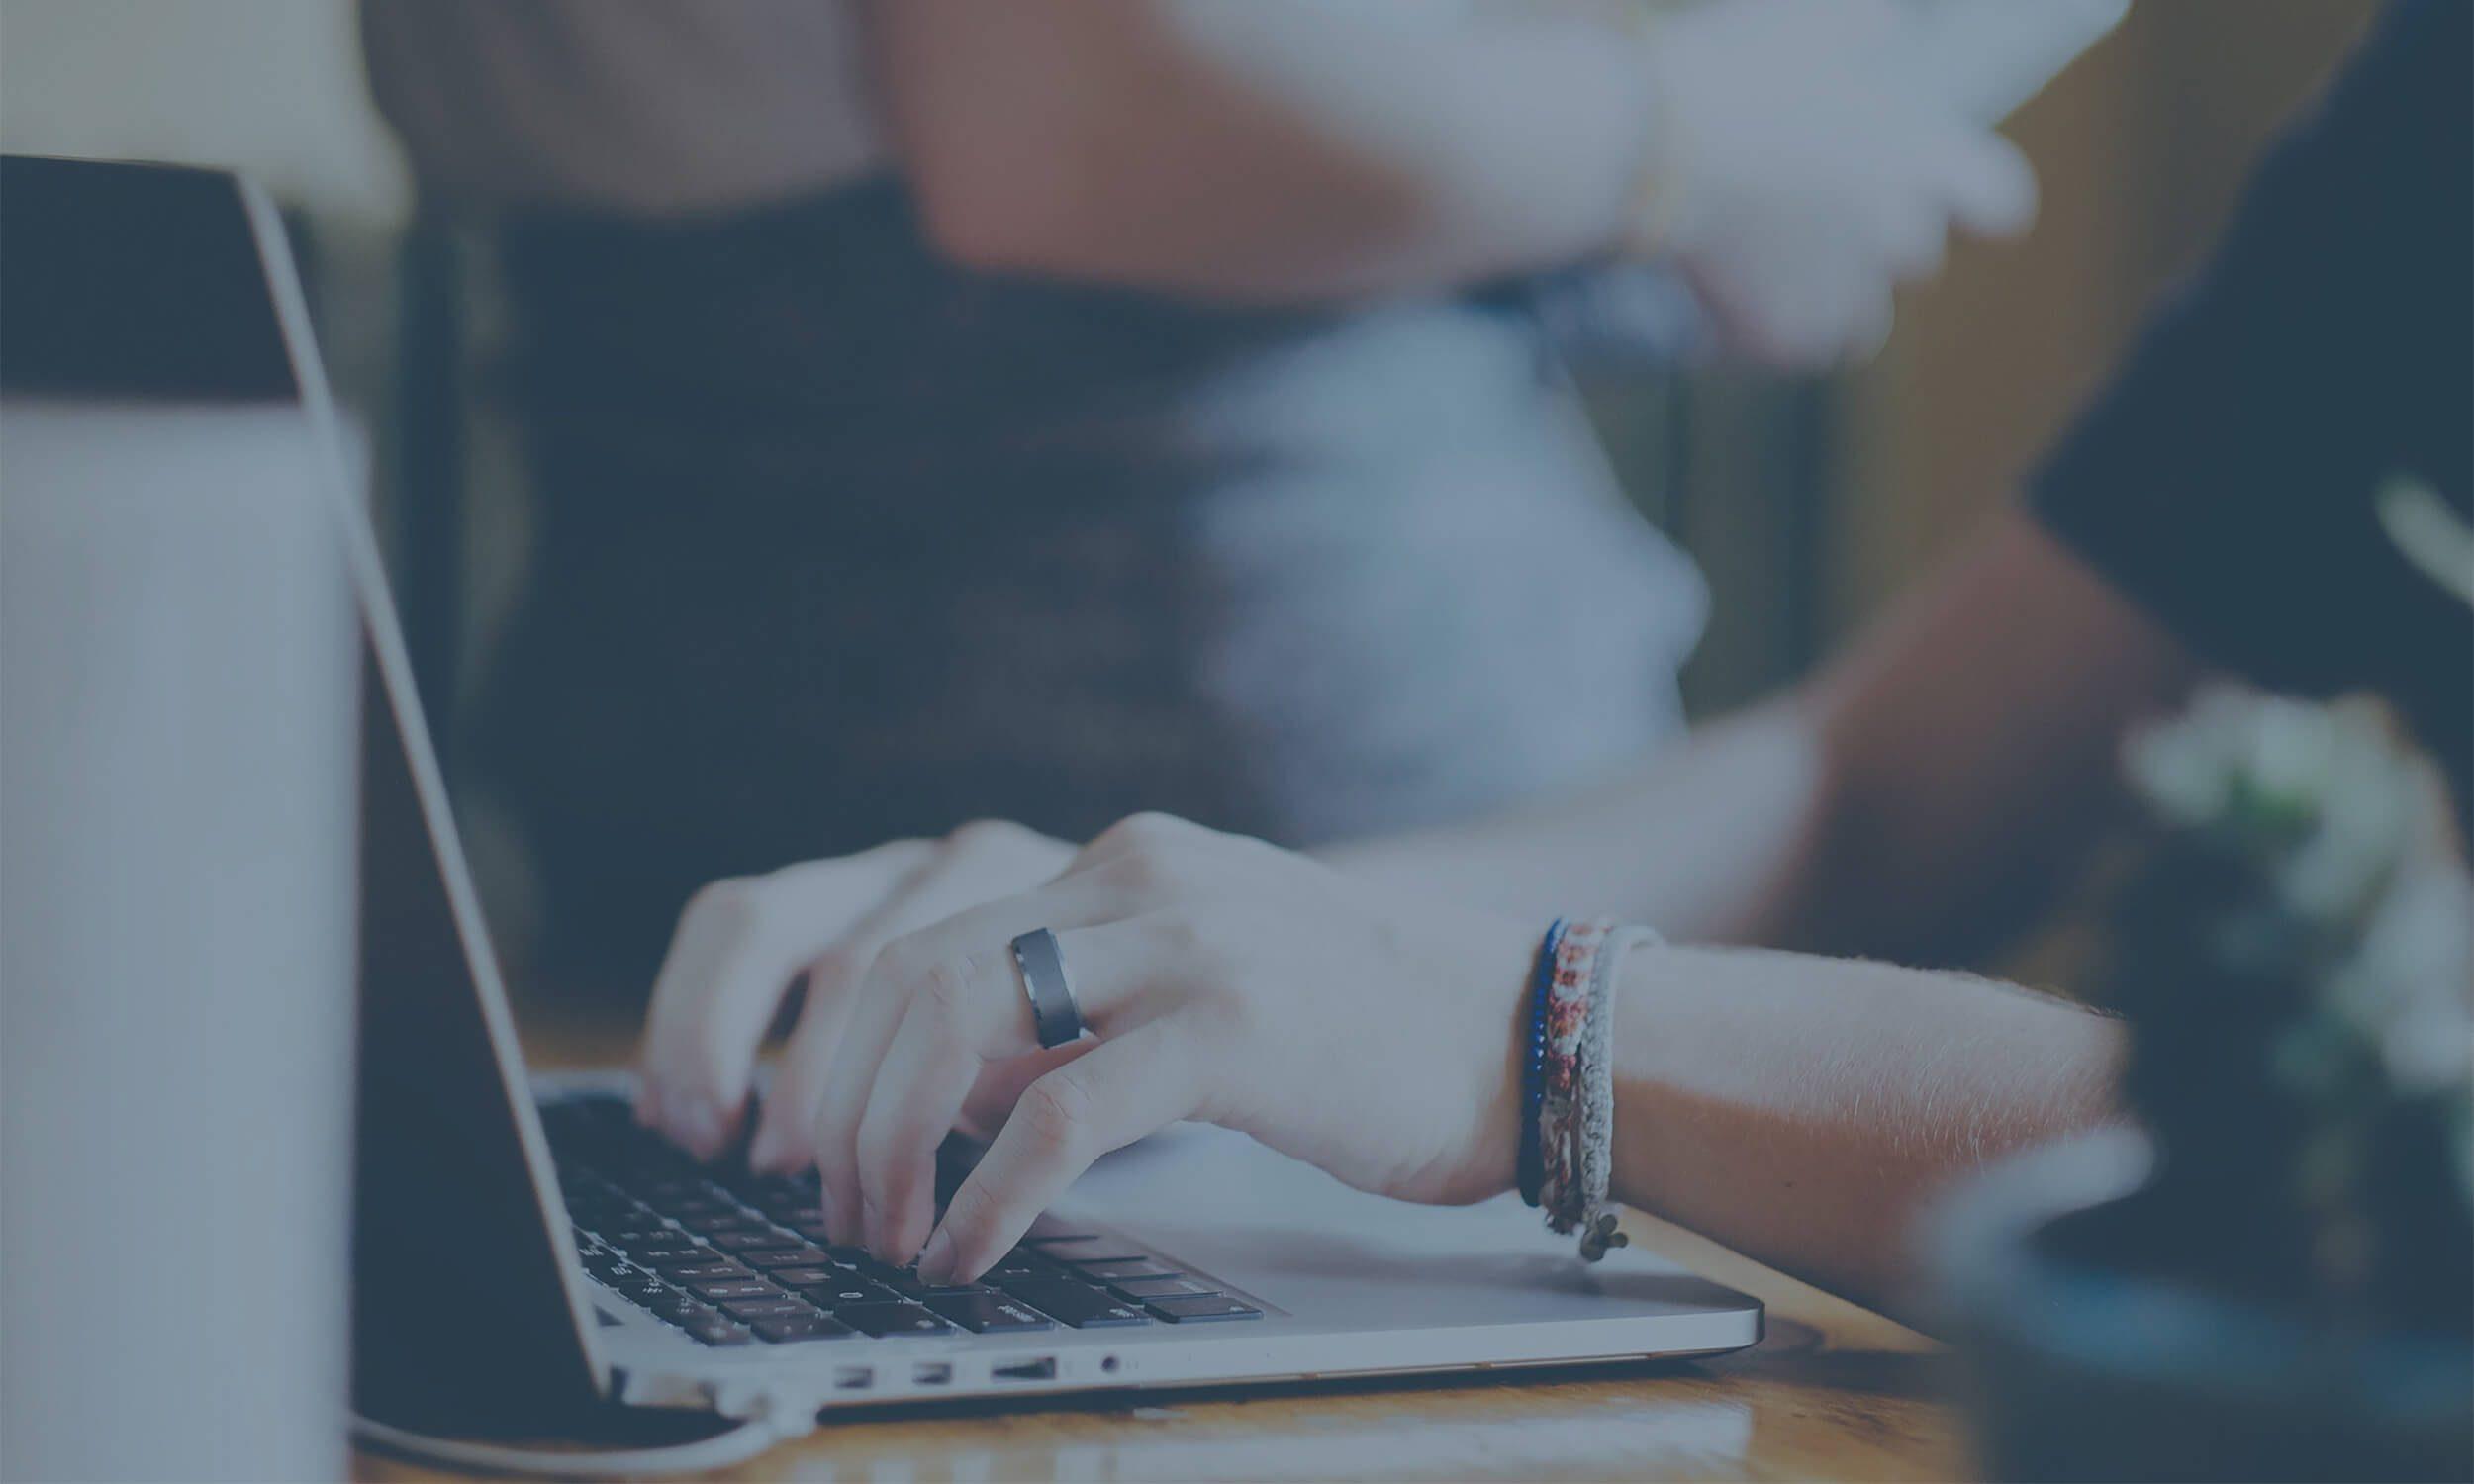 recruiter using software on laptop